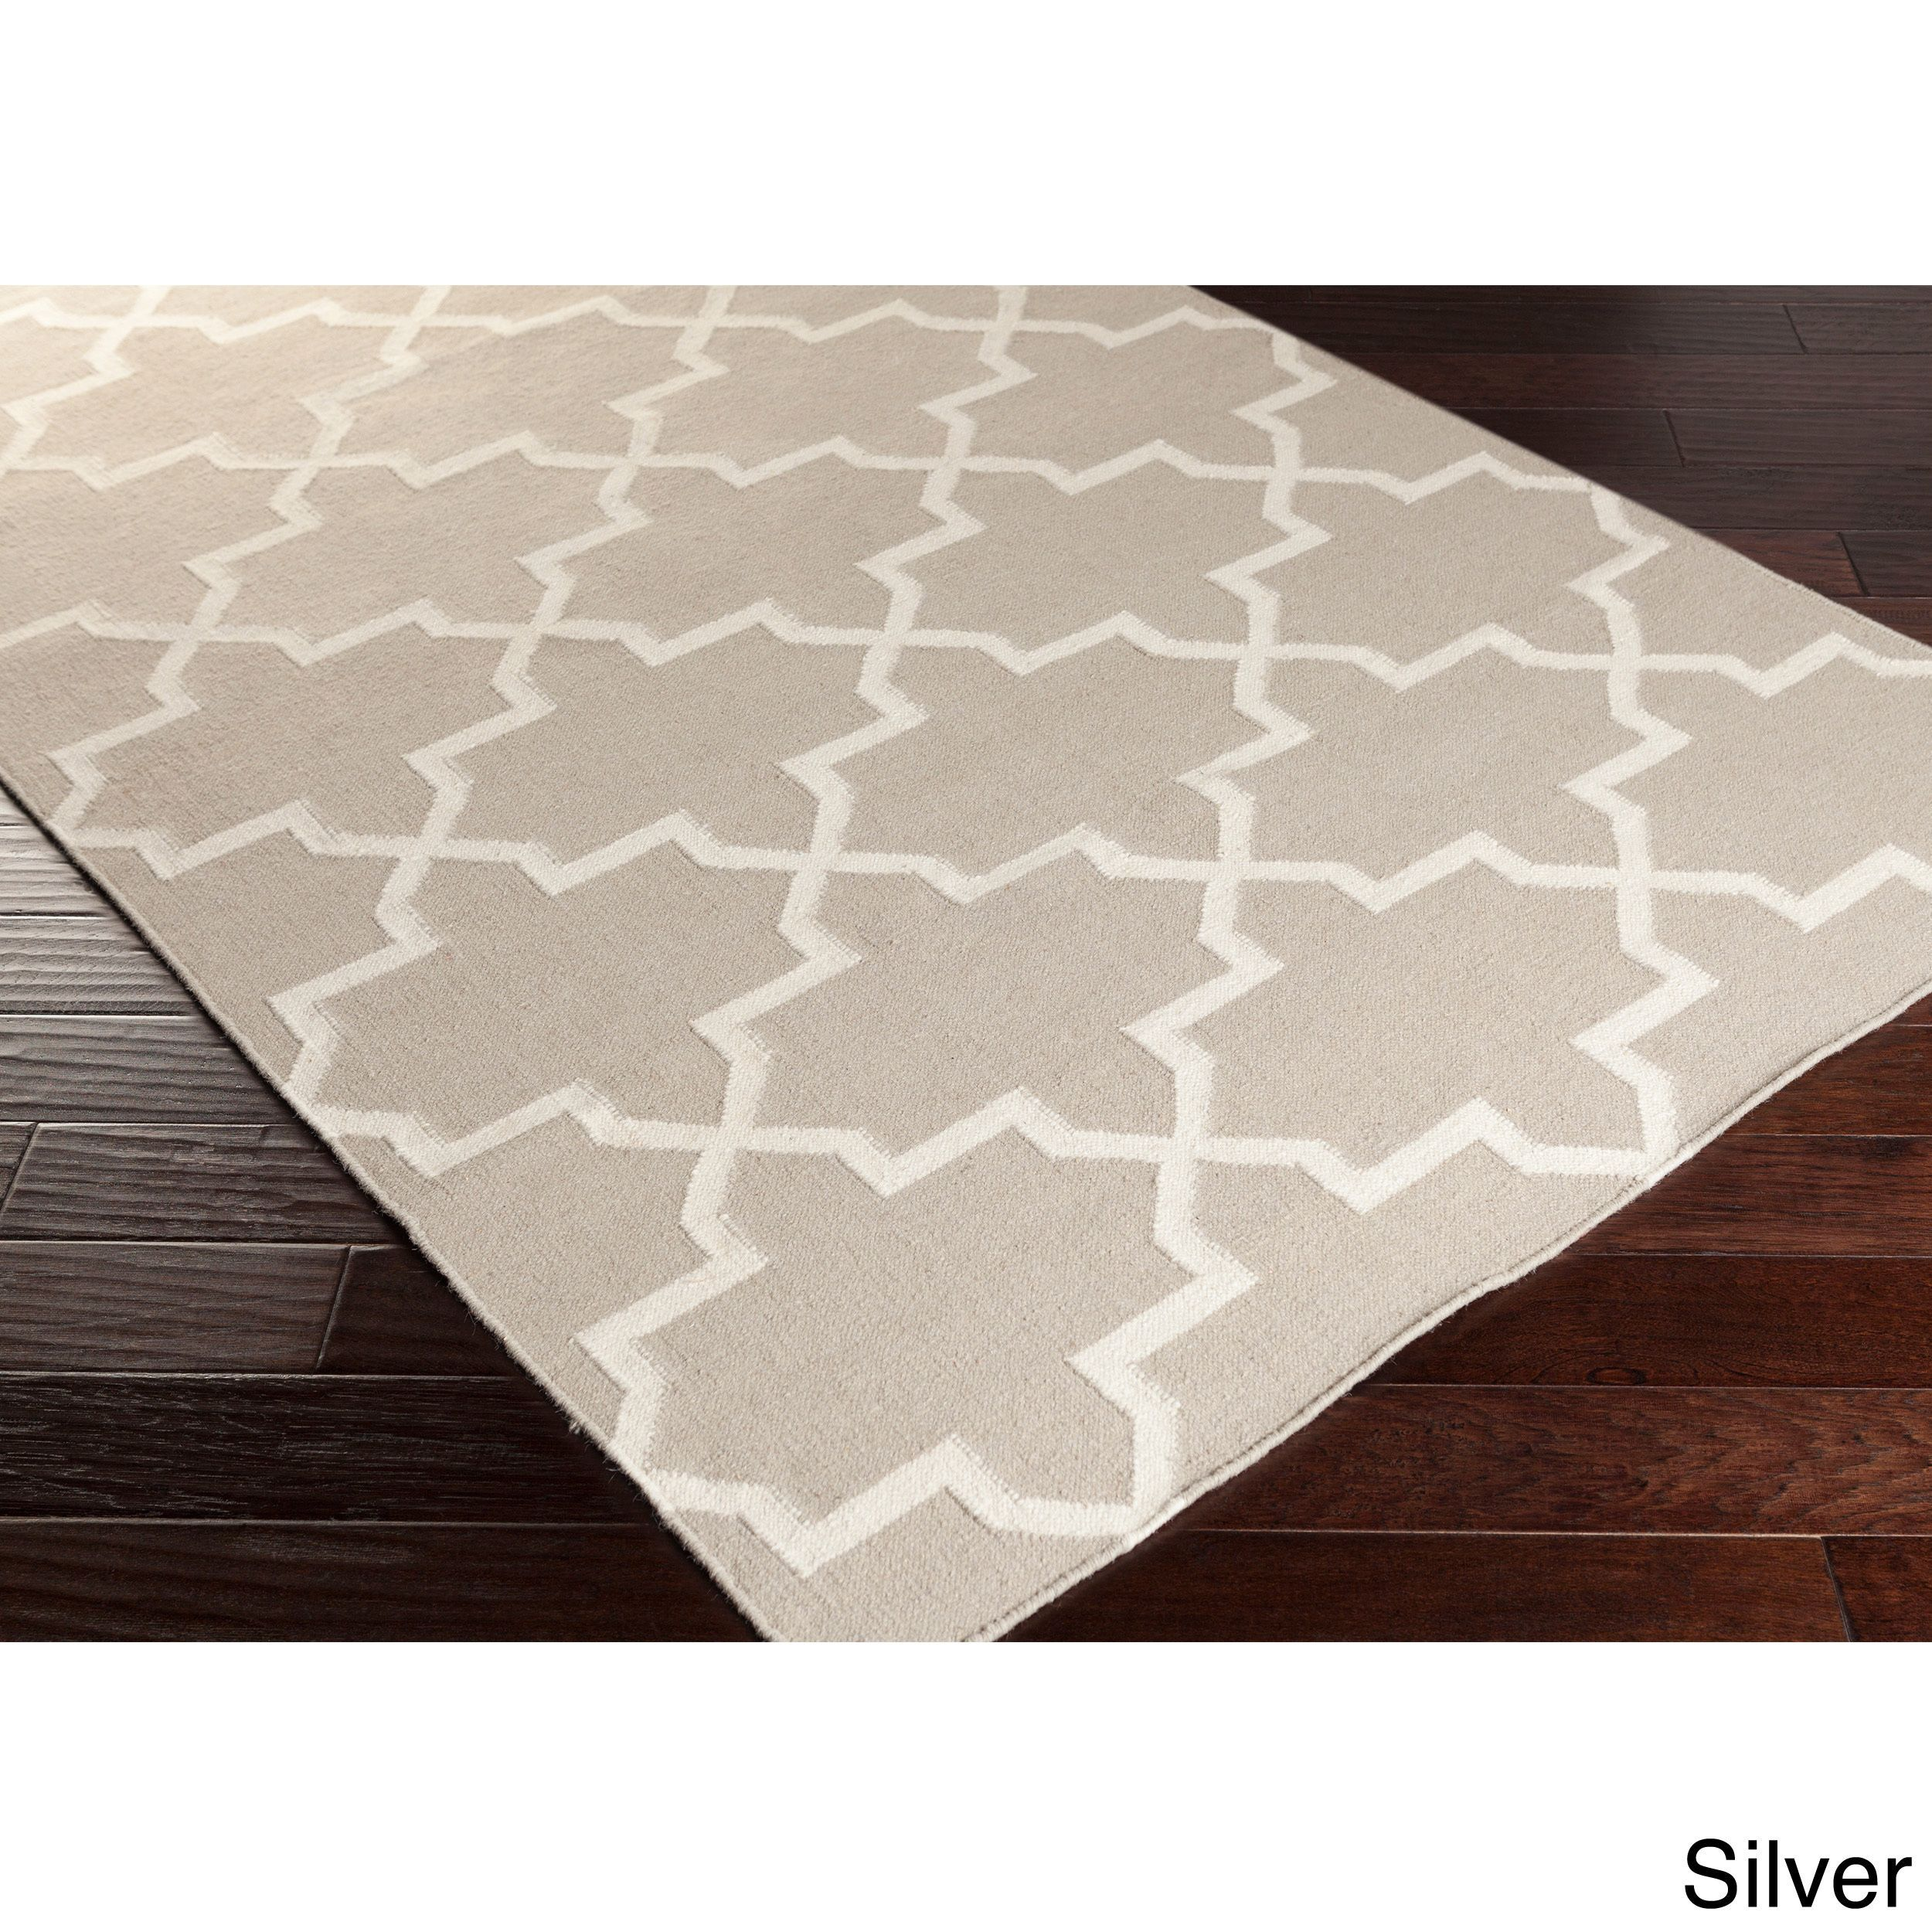 Hand Woven Carlisle Moroccan Tile Reversible Flatweave Wool Rug 4 X 6